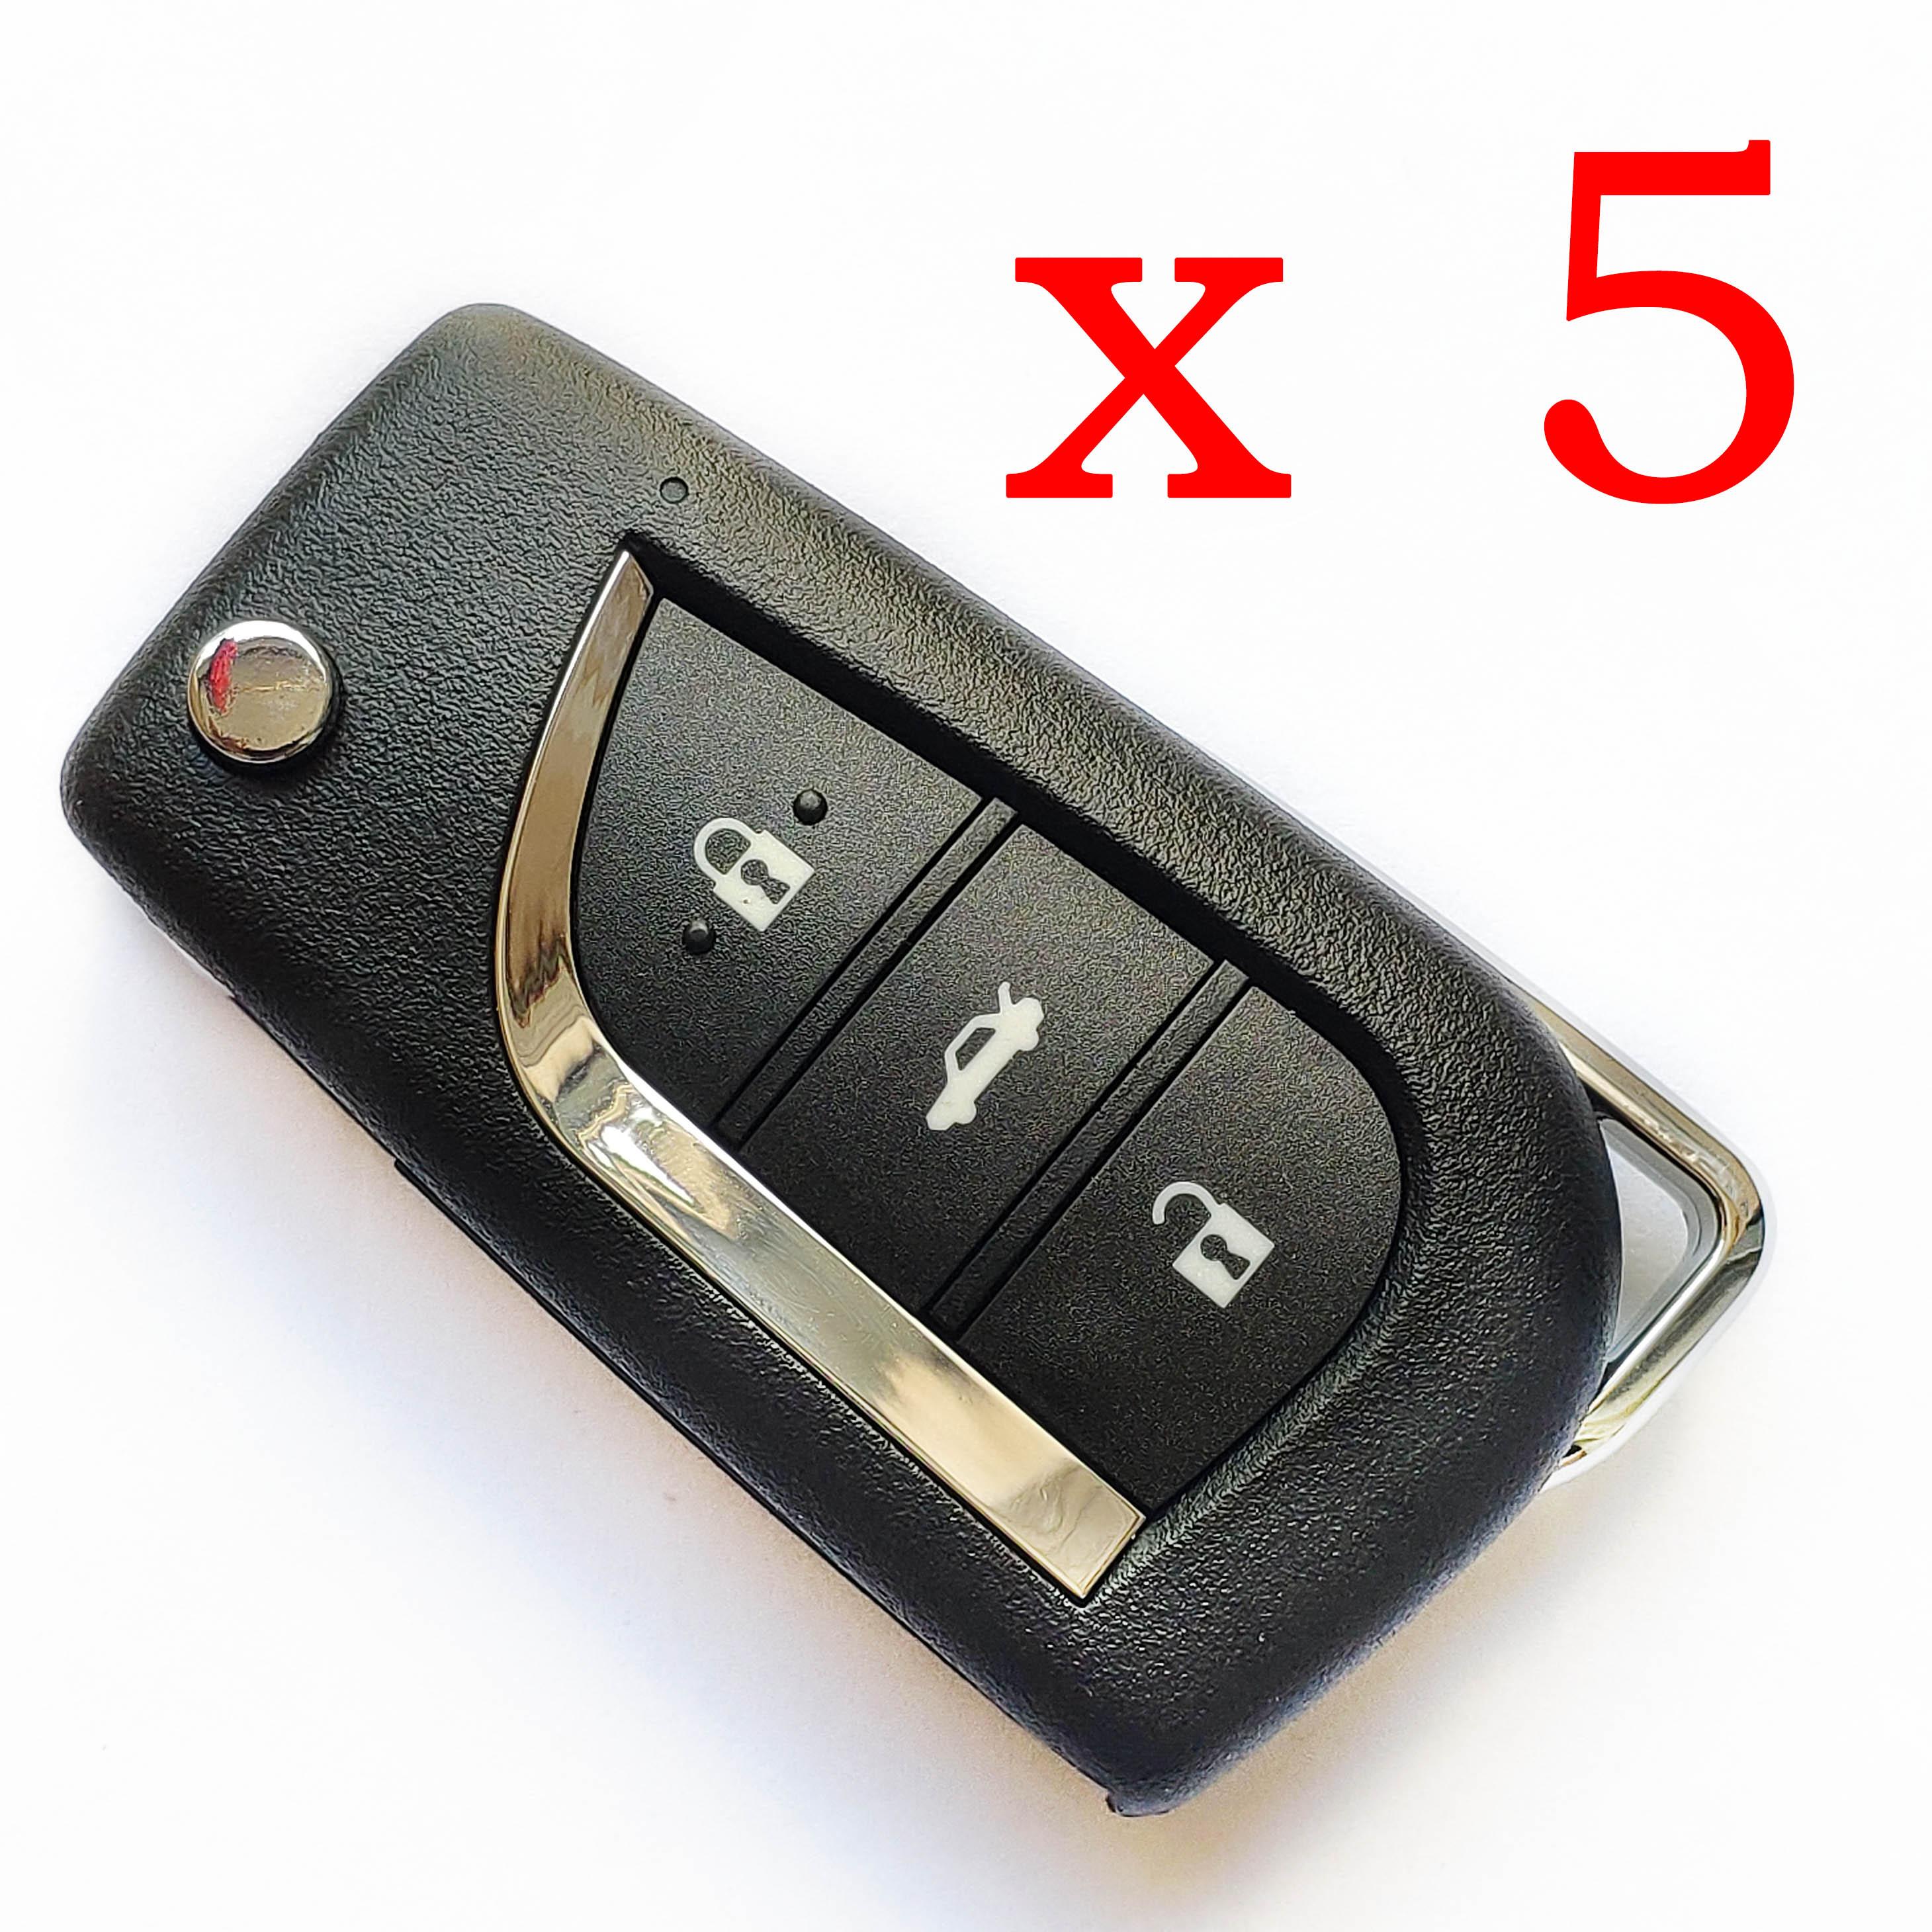 5 pieces Xhorse VVDI Toyota Type Universal Remote Control 3 Buttons - XKTO00EN